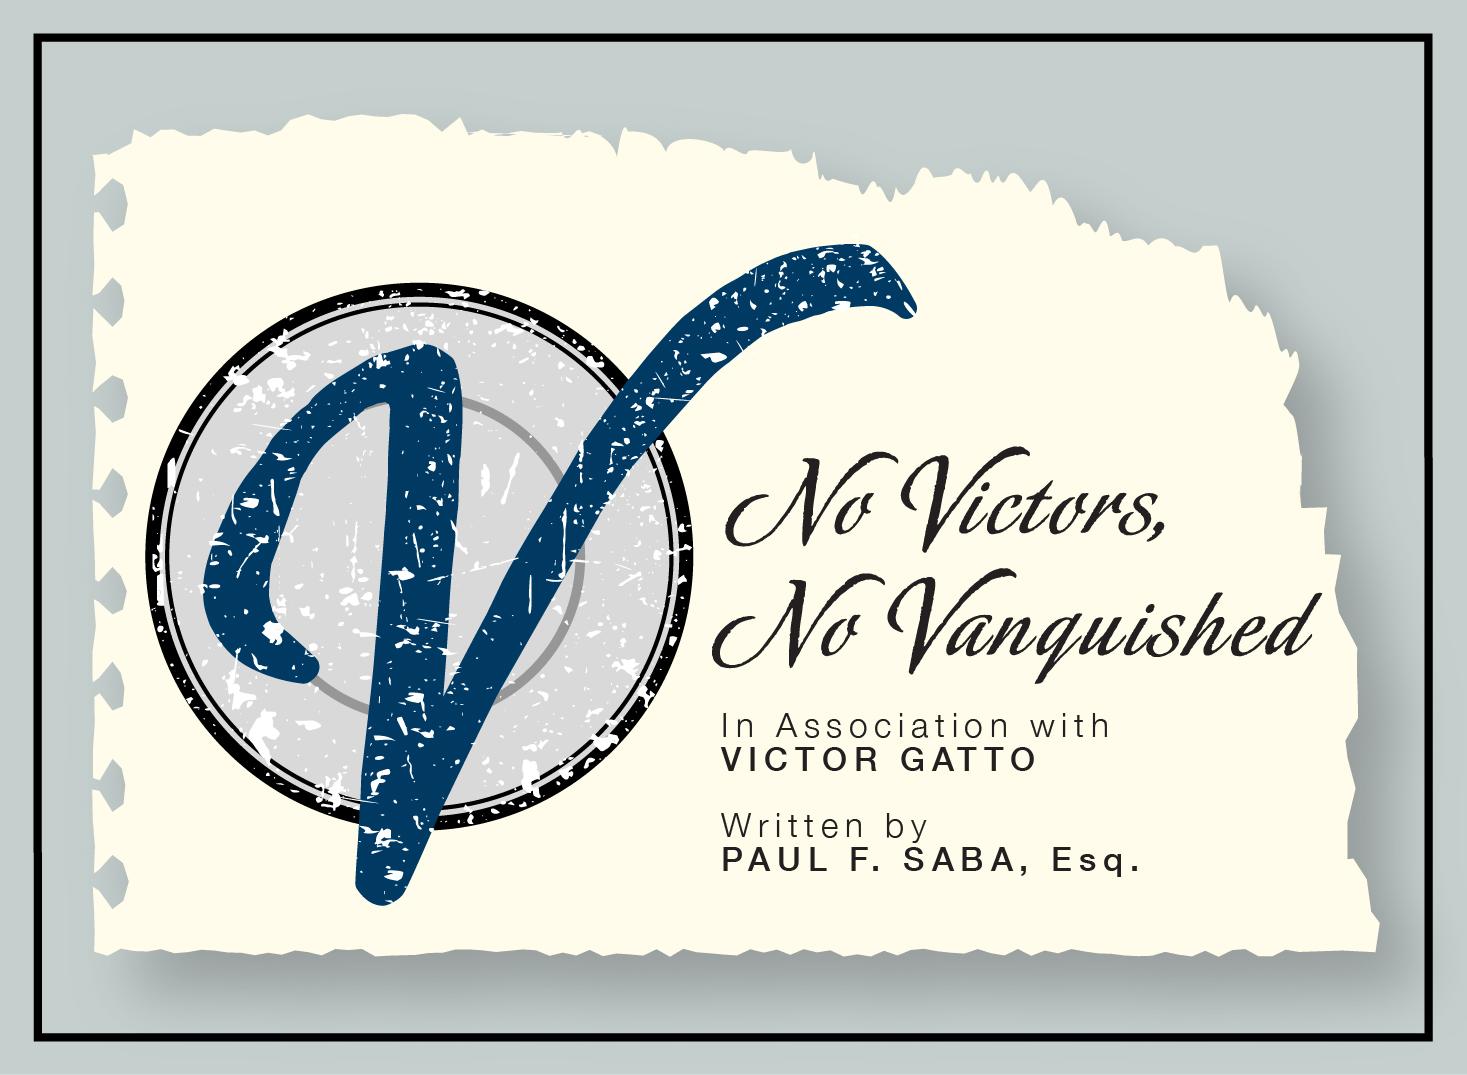 2019-NVNV-352x258-01.jpg